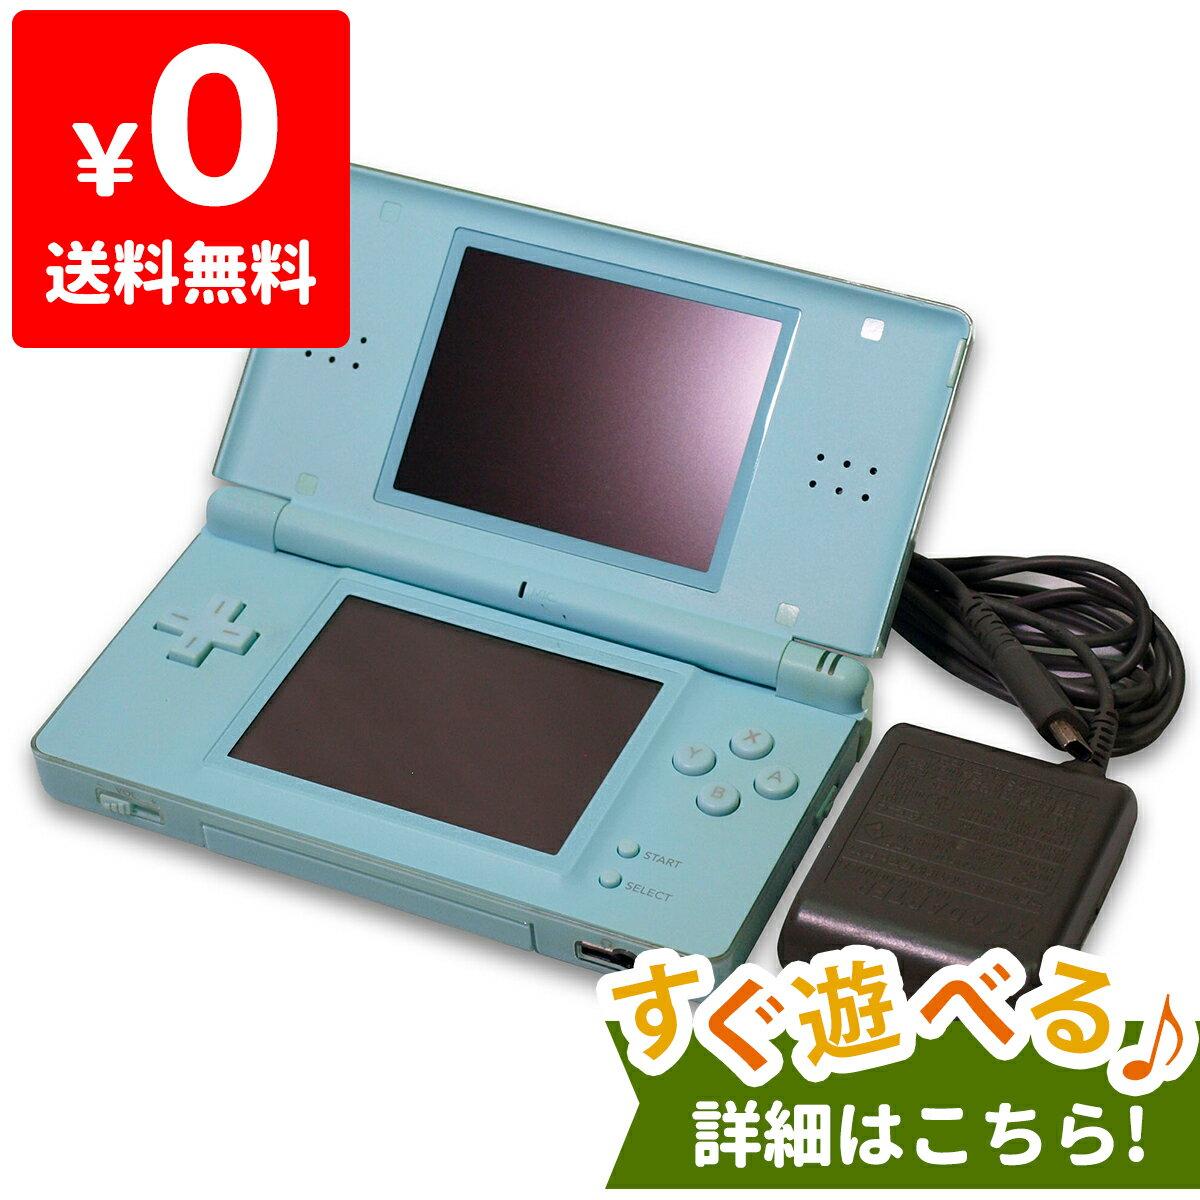 DSライト DSLite 本体 アイスブルー ニンテンドー 任天堂 Nintendo 中古 充電器&タッチペン付き すぐ遊べるセット 4902370512960 送料無料 【中古】